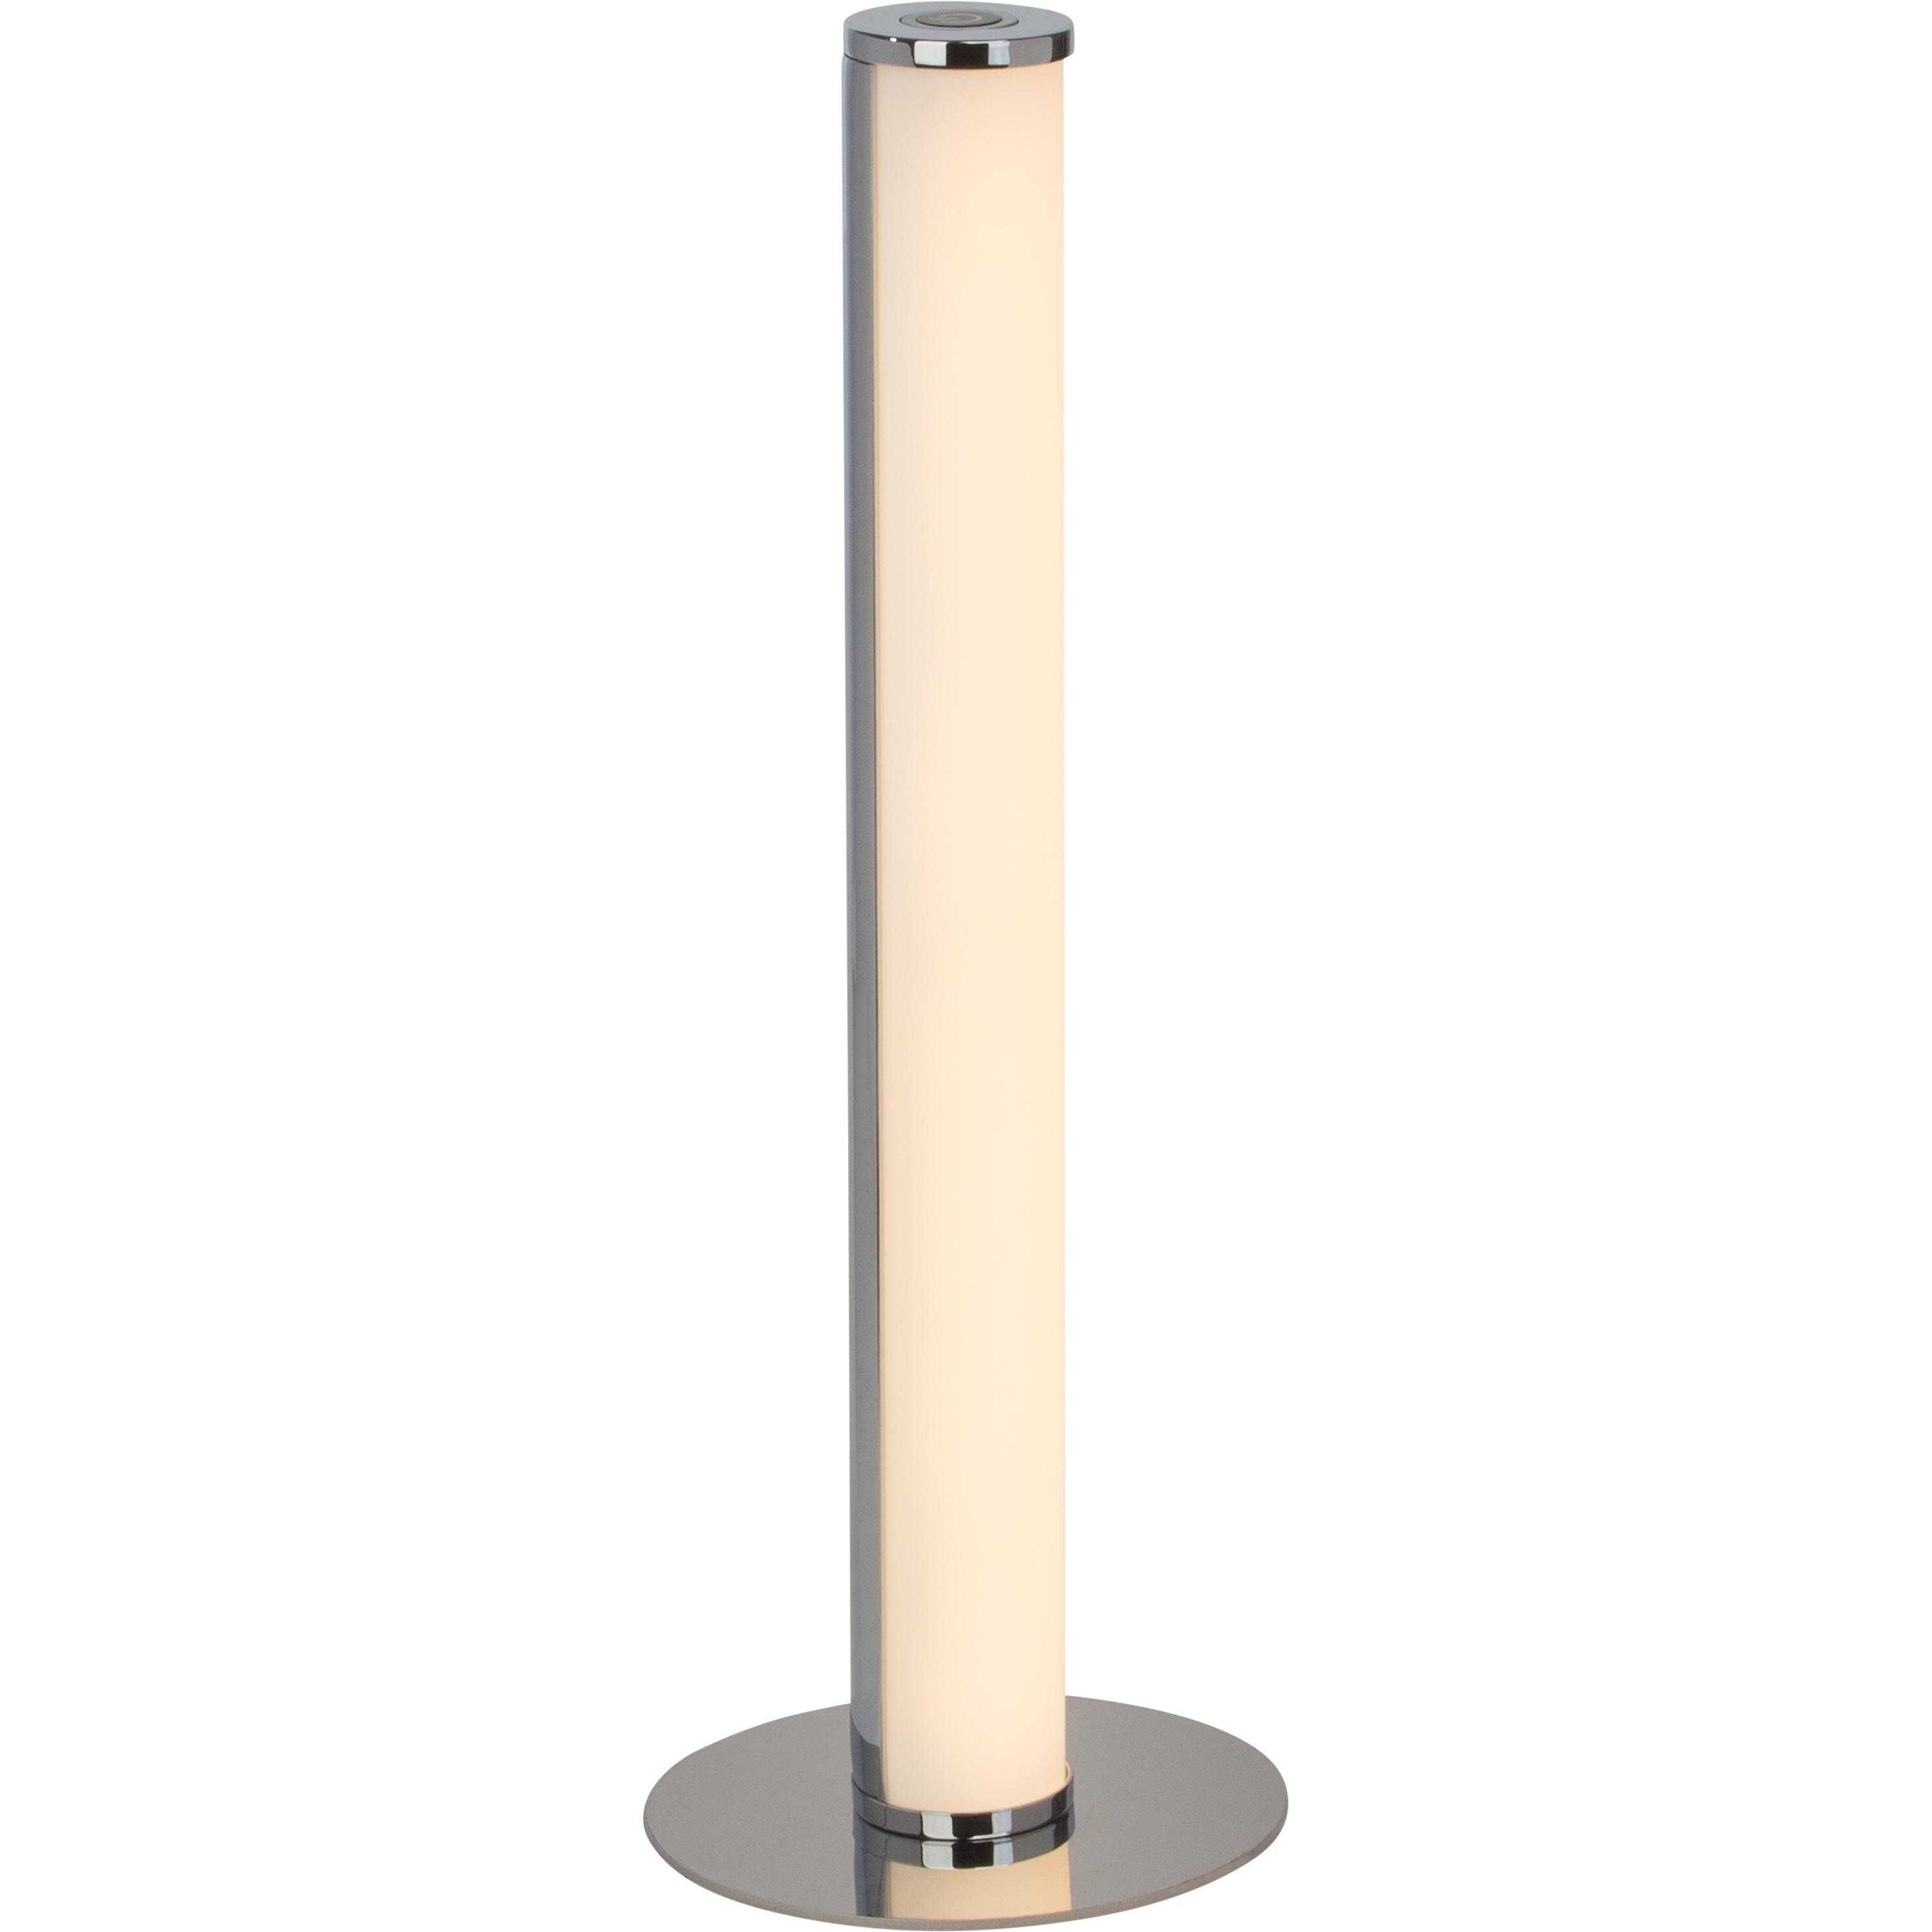 Brilliant Leuchten Tube LED Tischleuchte chrom/weiß | Lampen > Tischleuchten > Beistelltischlampen | Weiß | Metall - Kunststoff | BRILLIANT LEUCHTEN